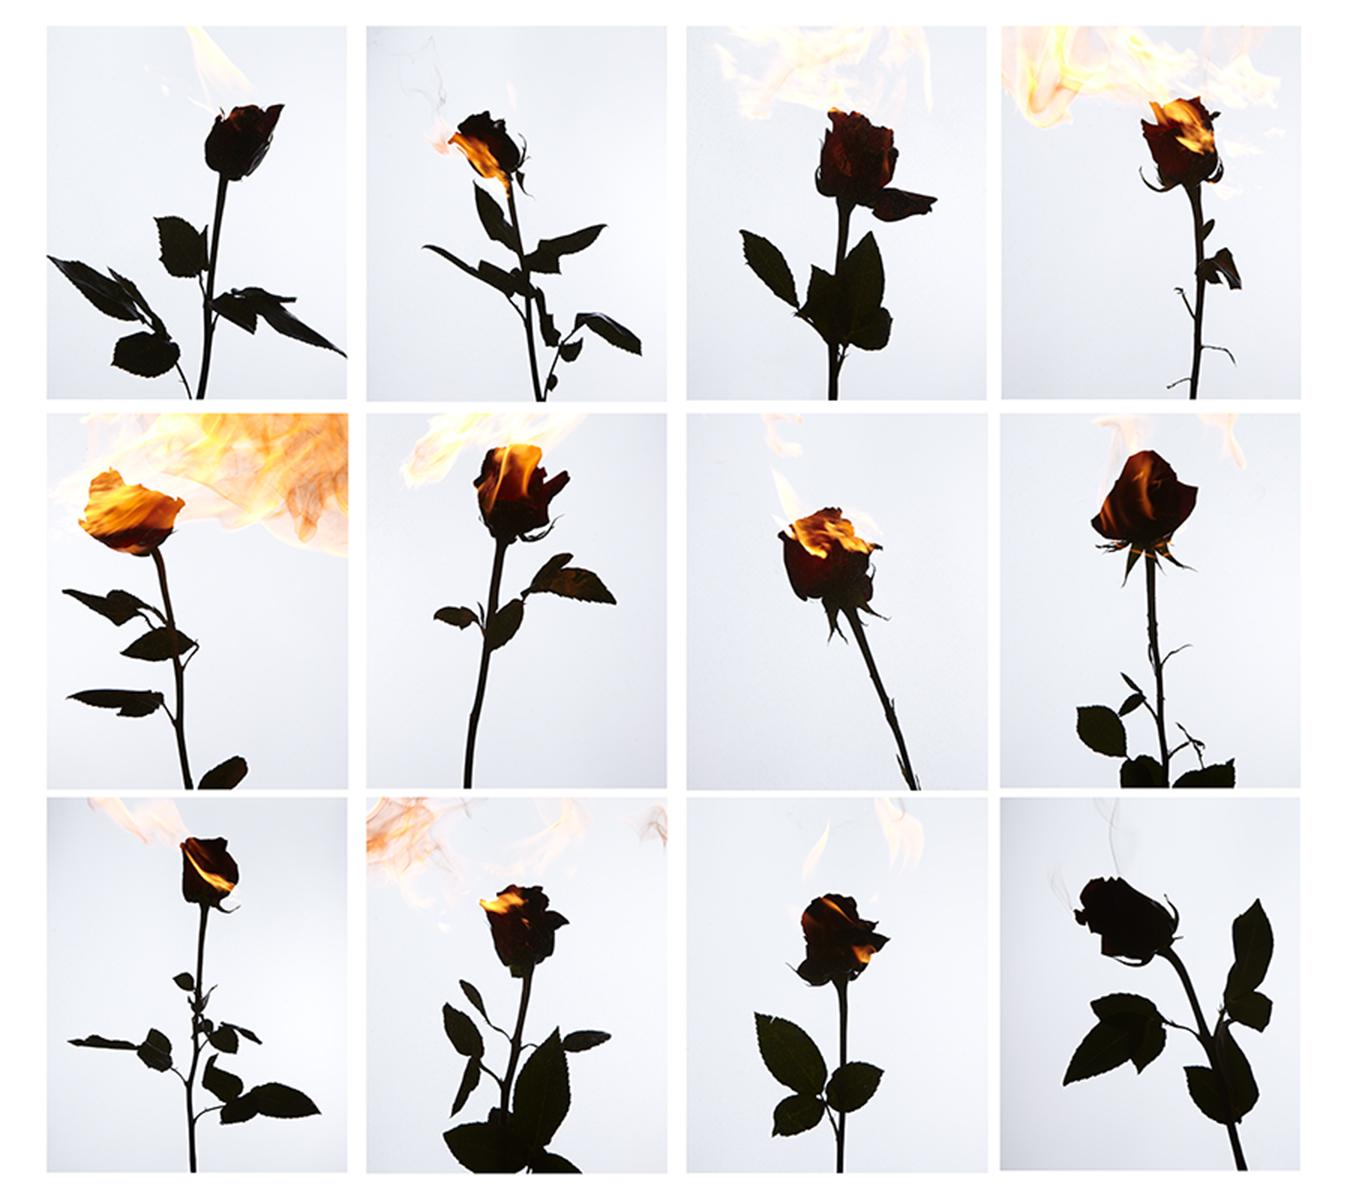 AnnieBuado_Flowers_06.jpg